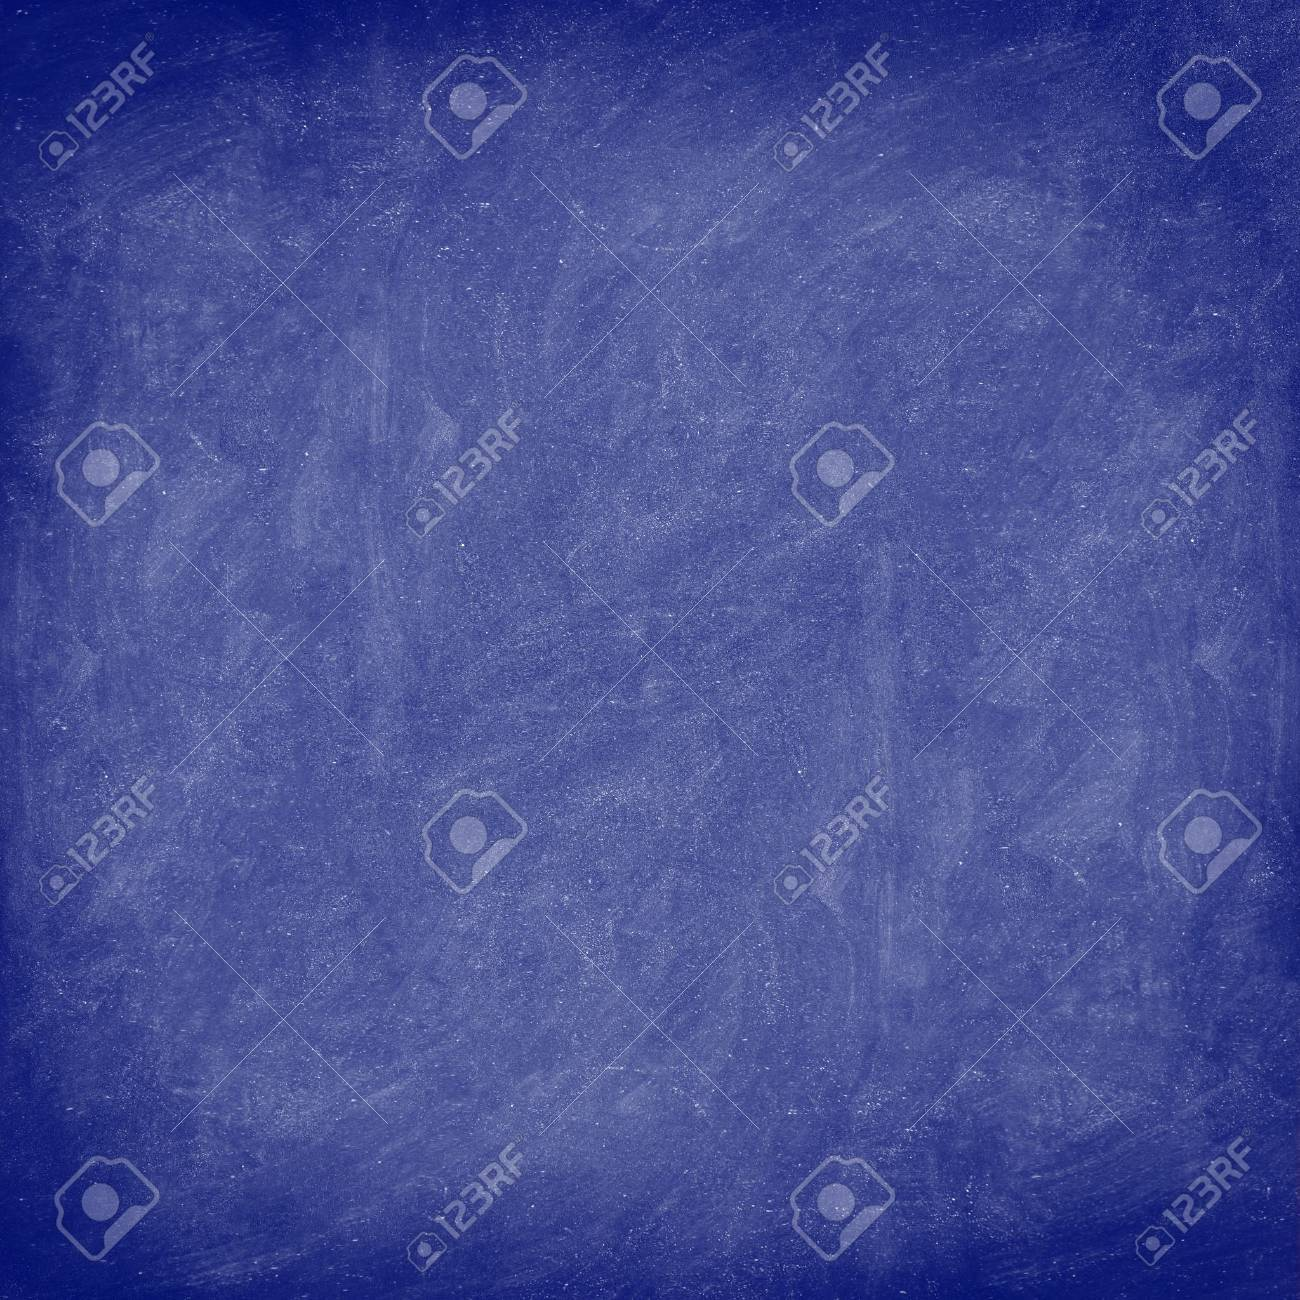 Texture - blue chalkboard / blackboard background closeup. - 10916754